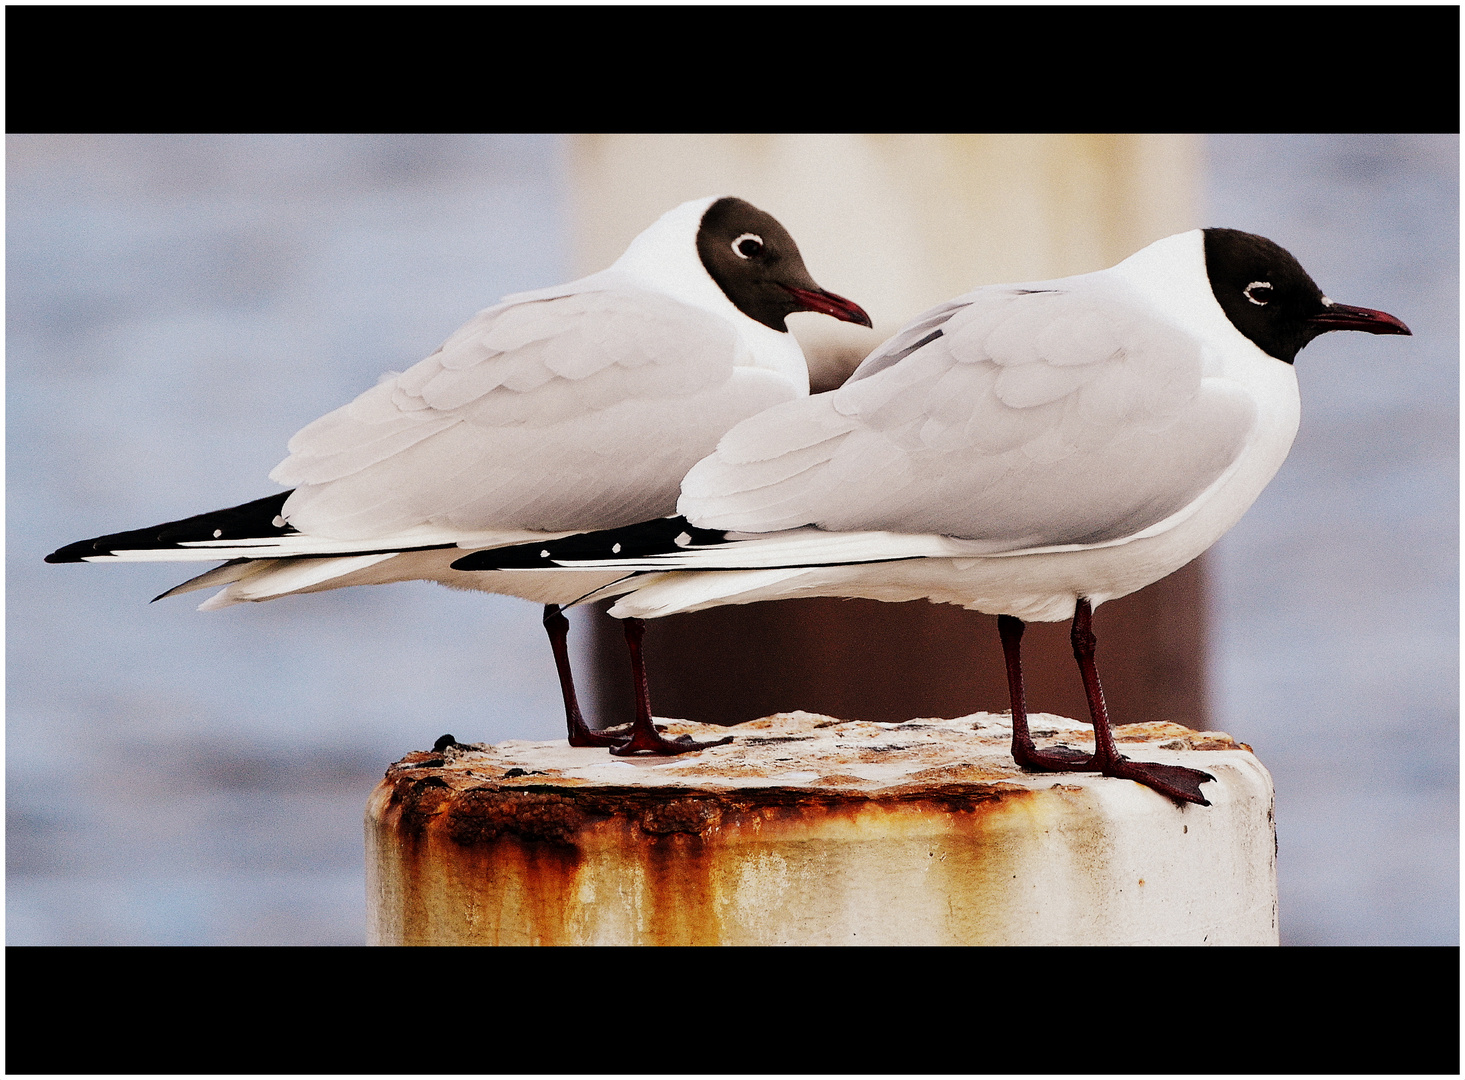 Lachmöwen, black-headed gulls